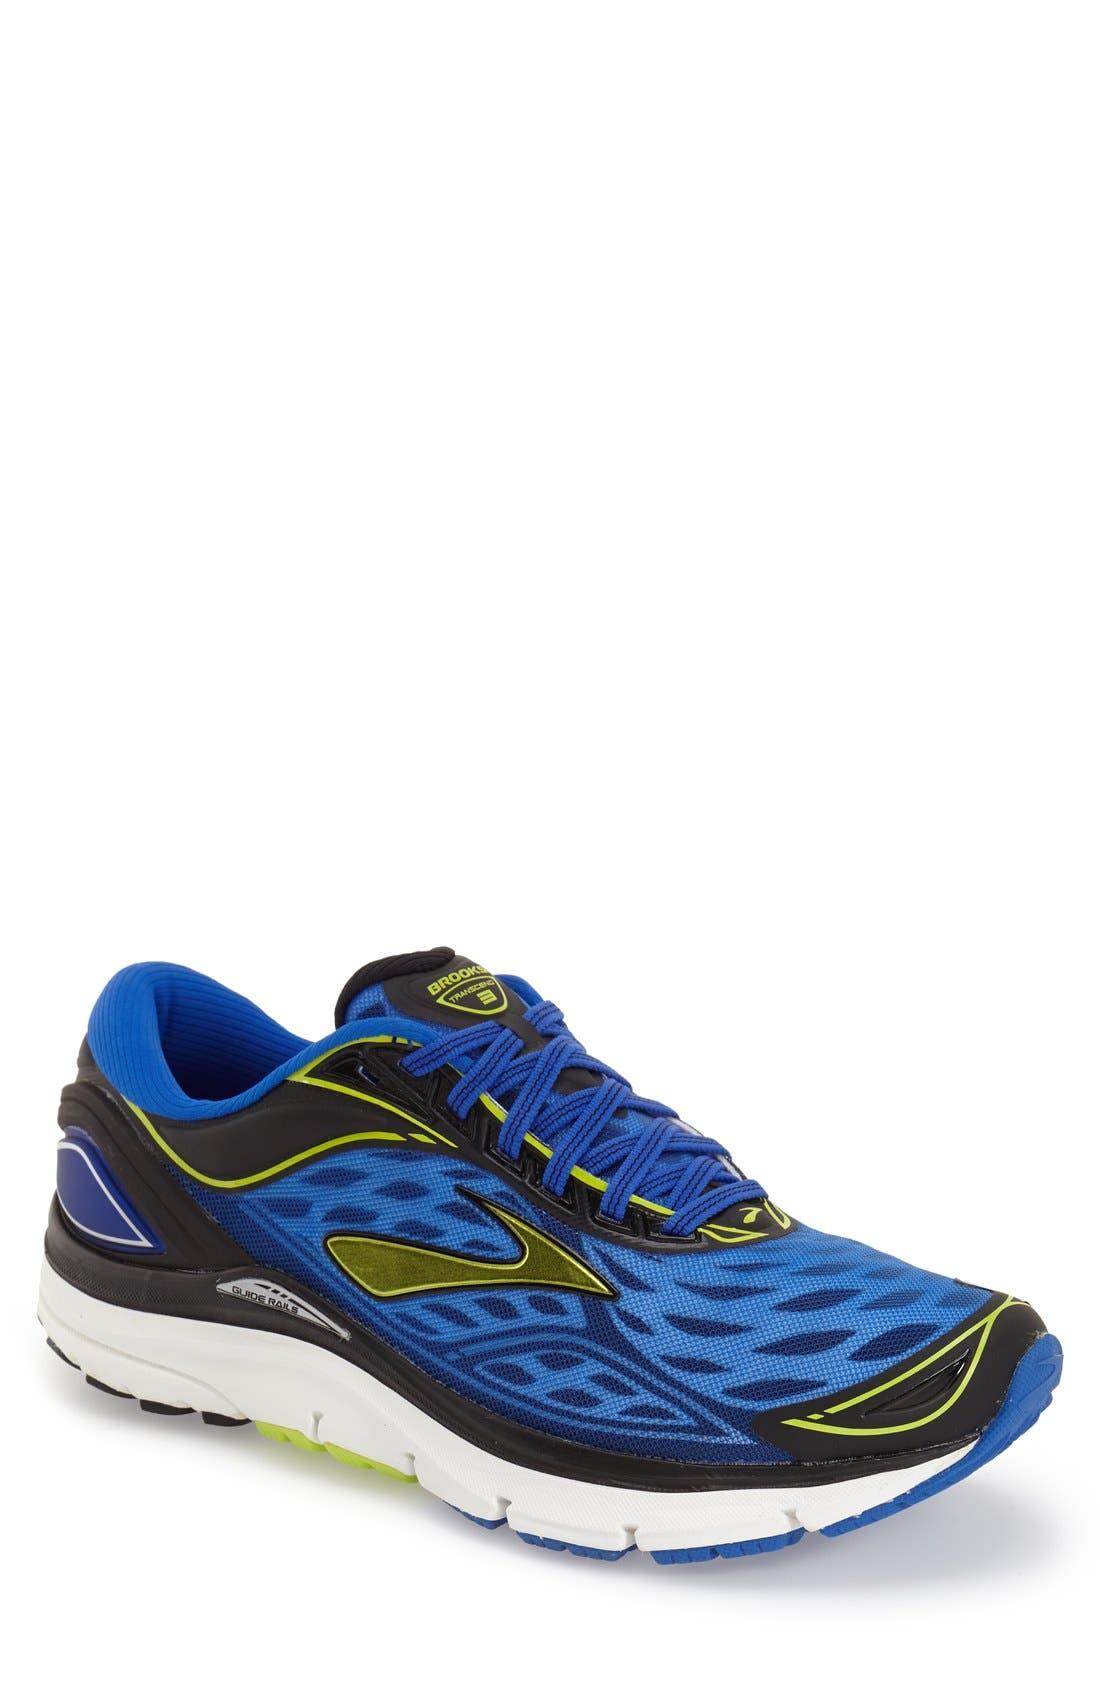 'Transcend 3' Running Shoe,                             Main thumbnail 1, color,                             Electric Blue/ Lime/ Black